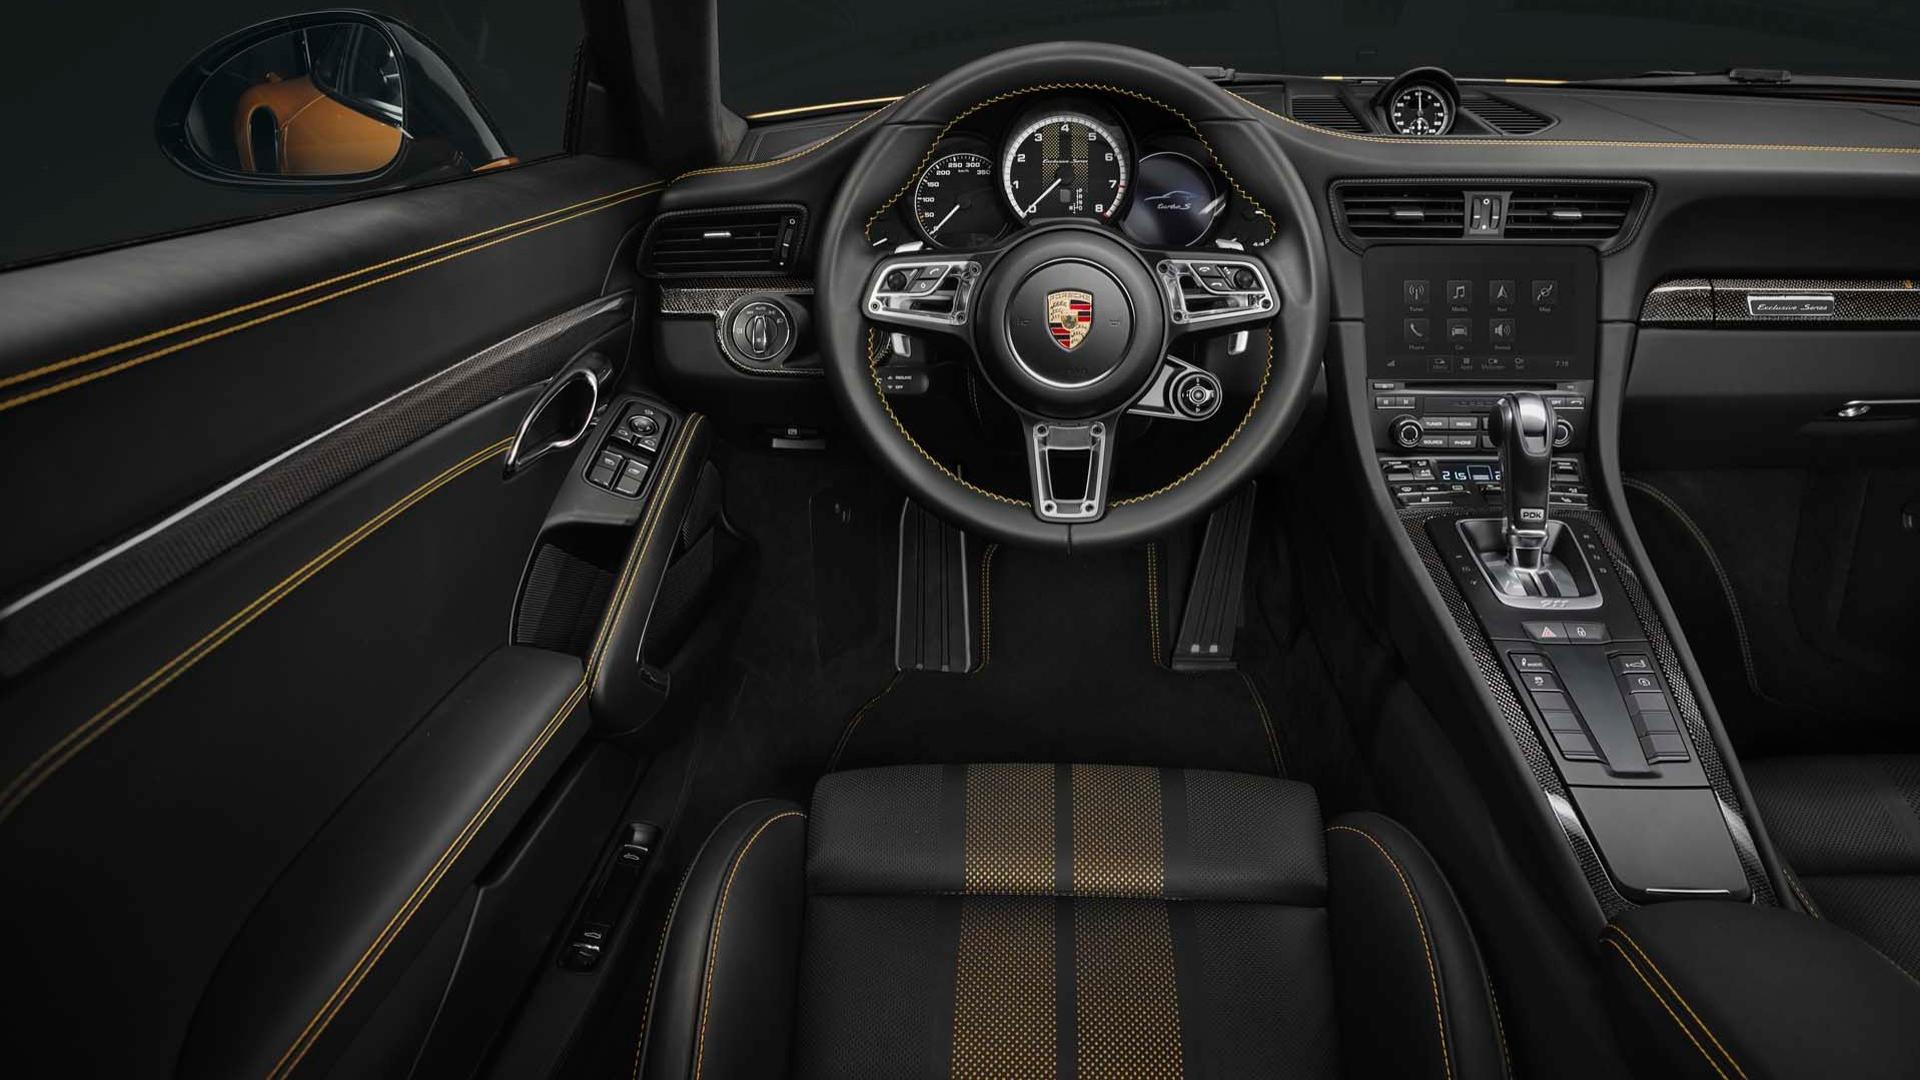 Porsche_911_Turbo_S_Exclusive_Series_24